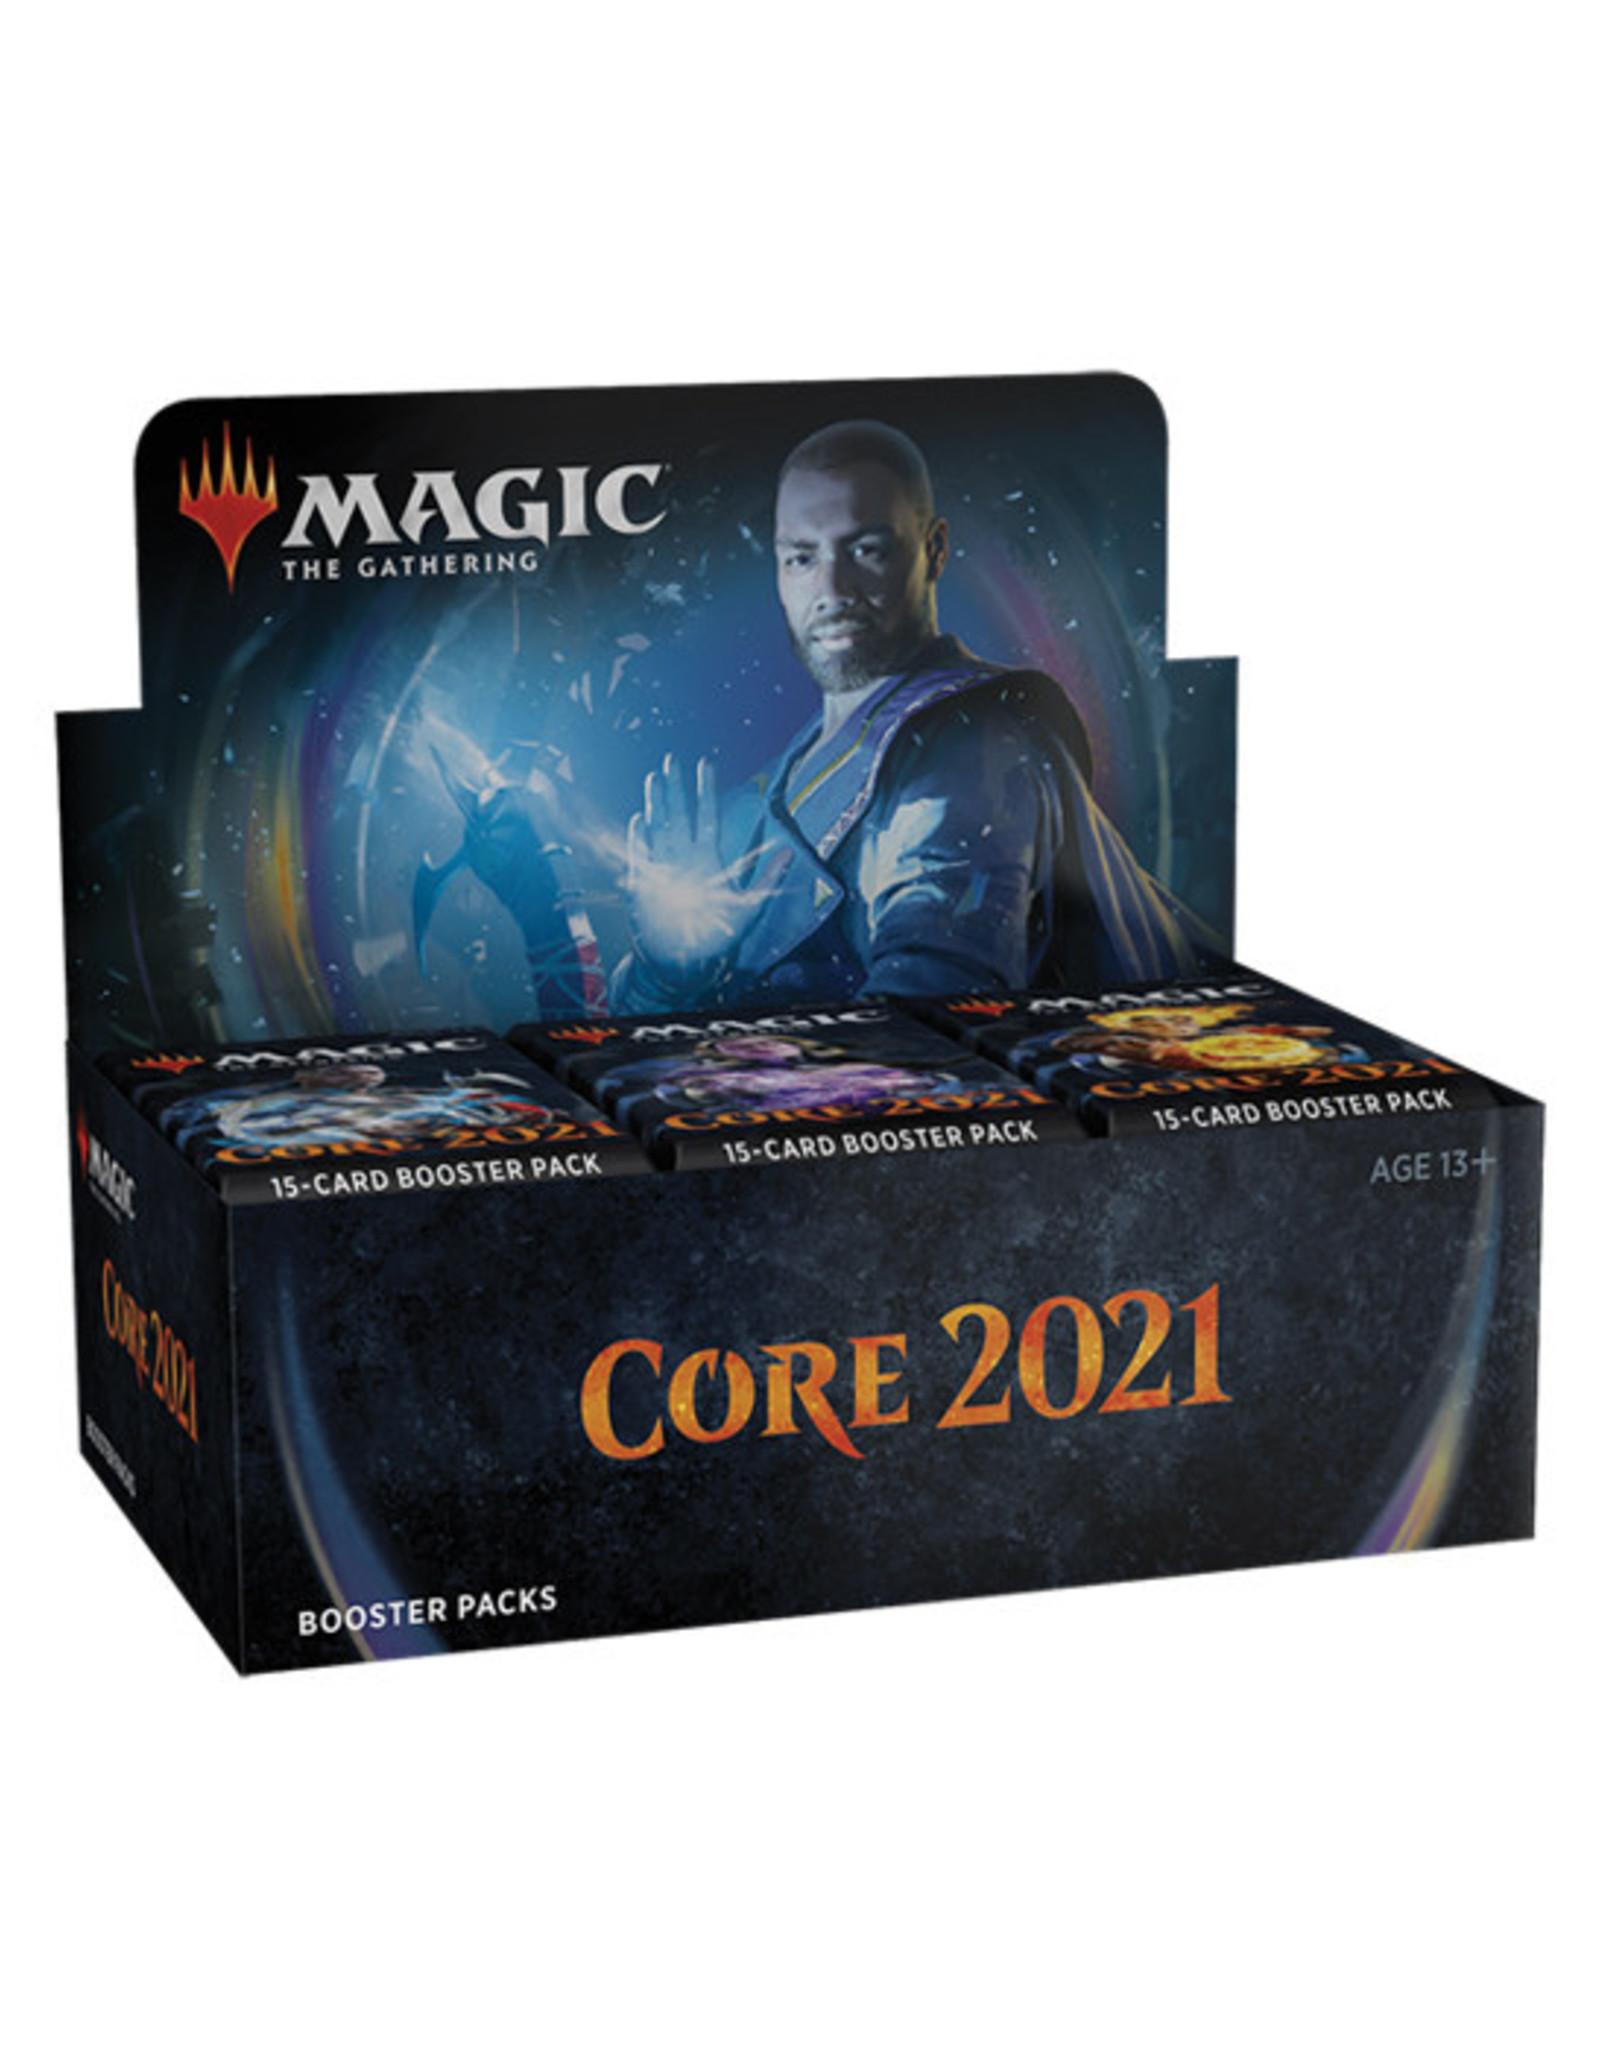 Magic: The Gathering Magic: The Gathering - Core 2021 - Booster Box